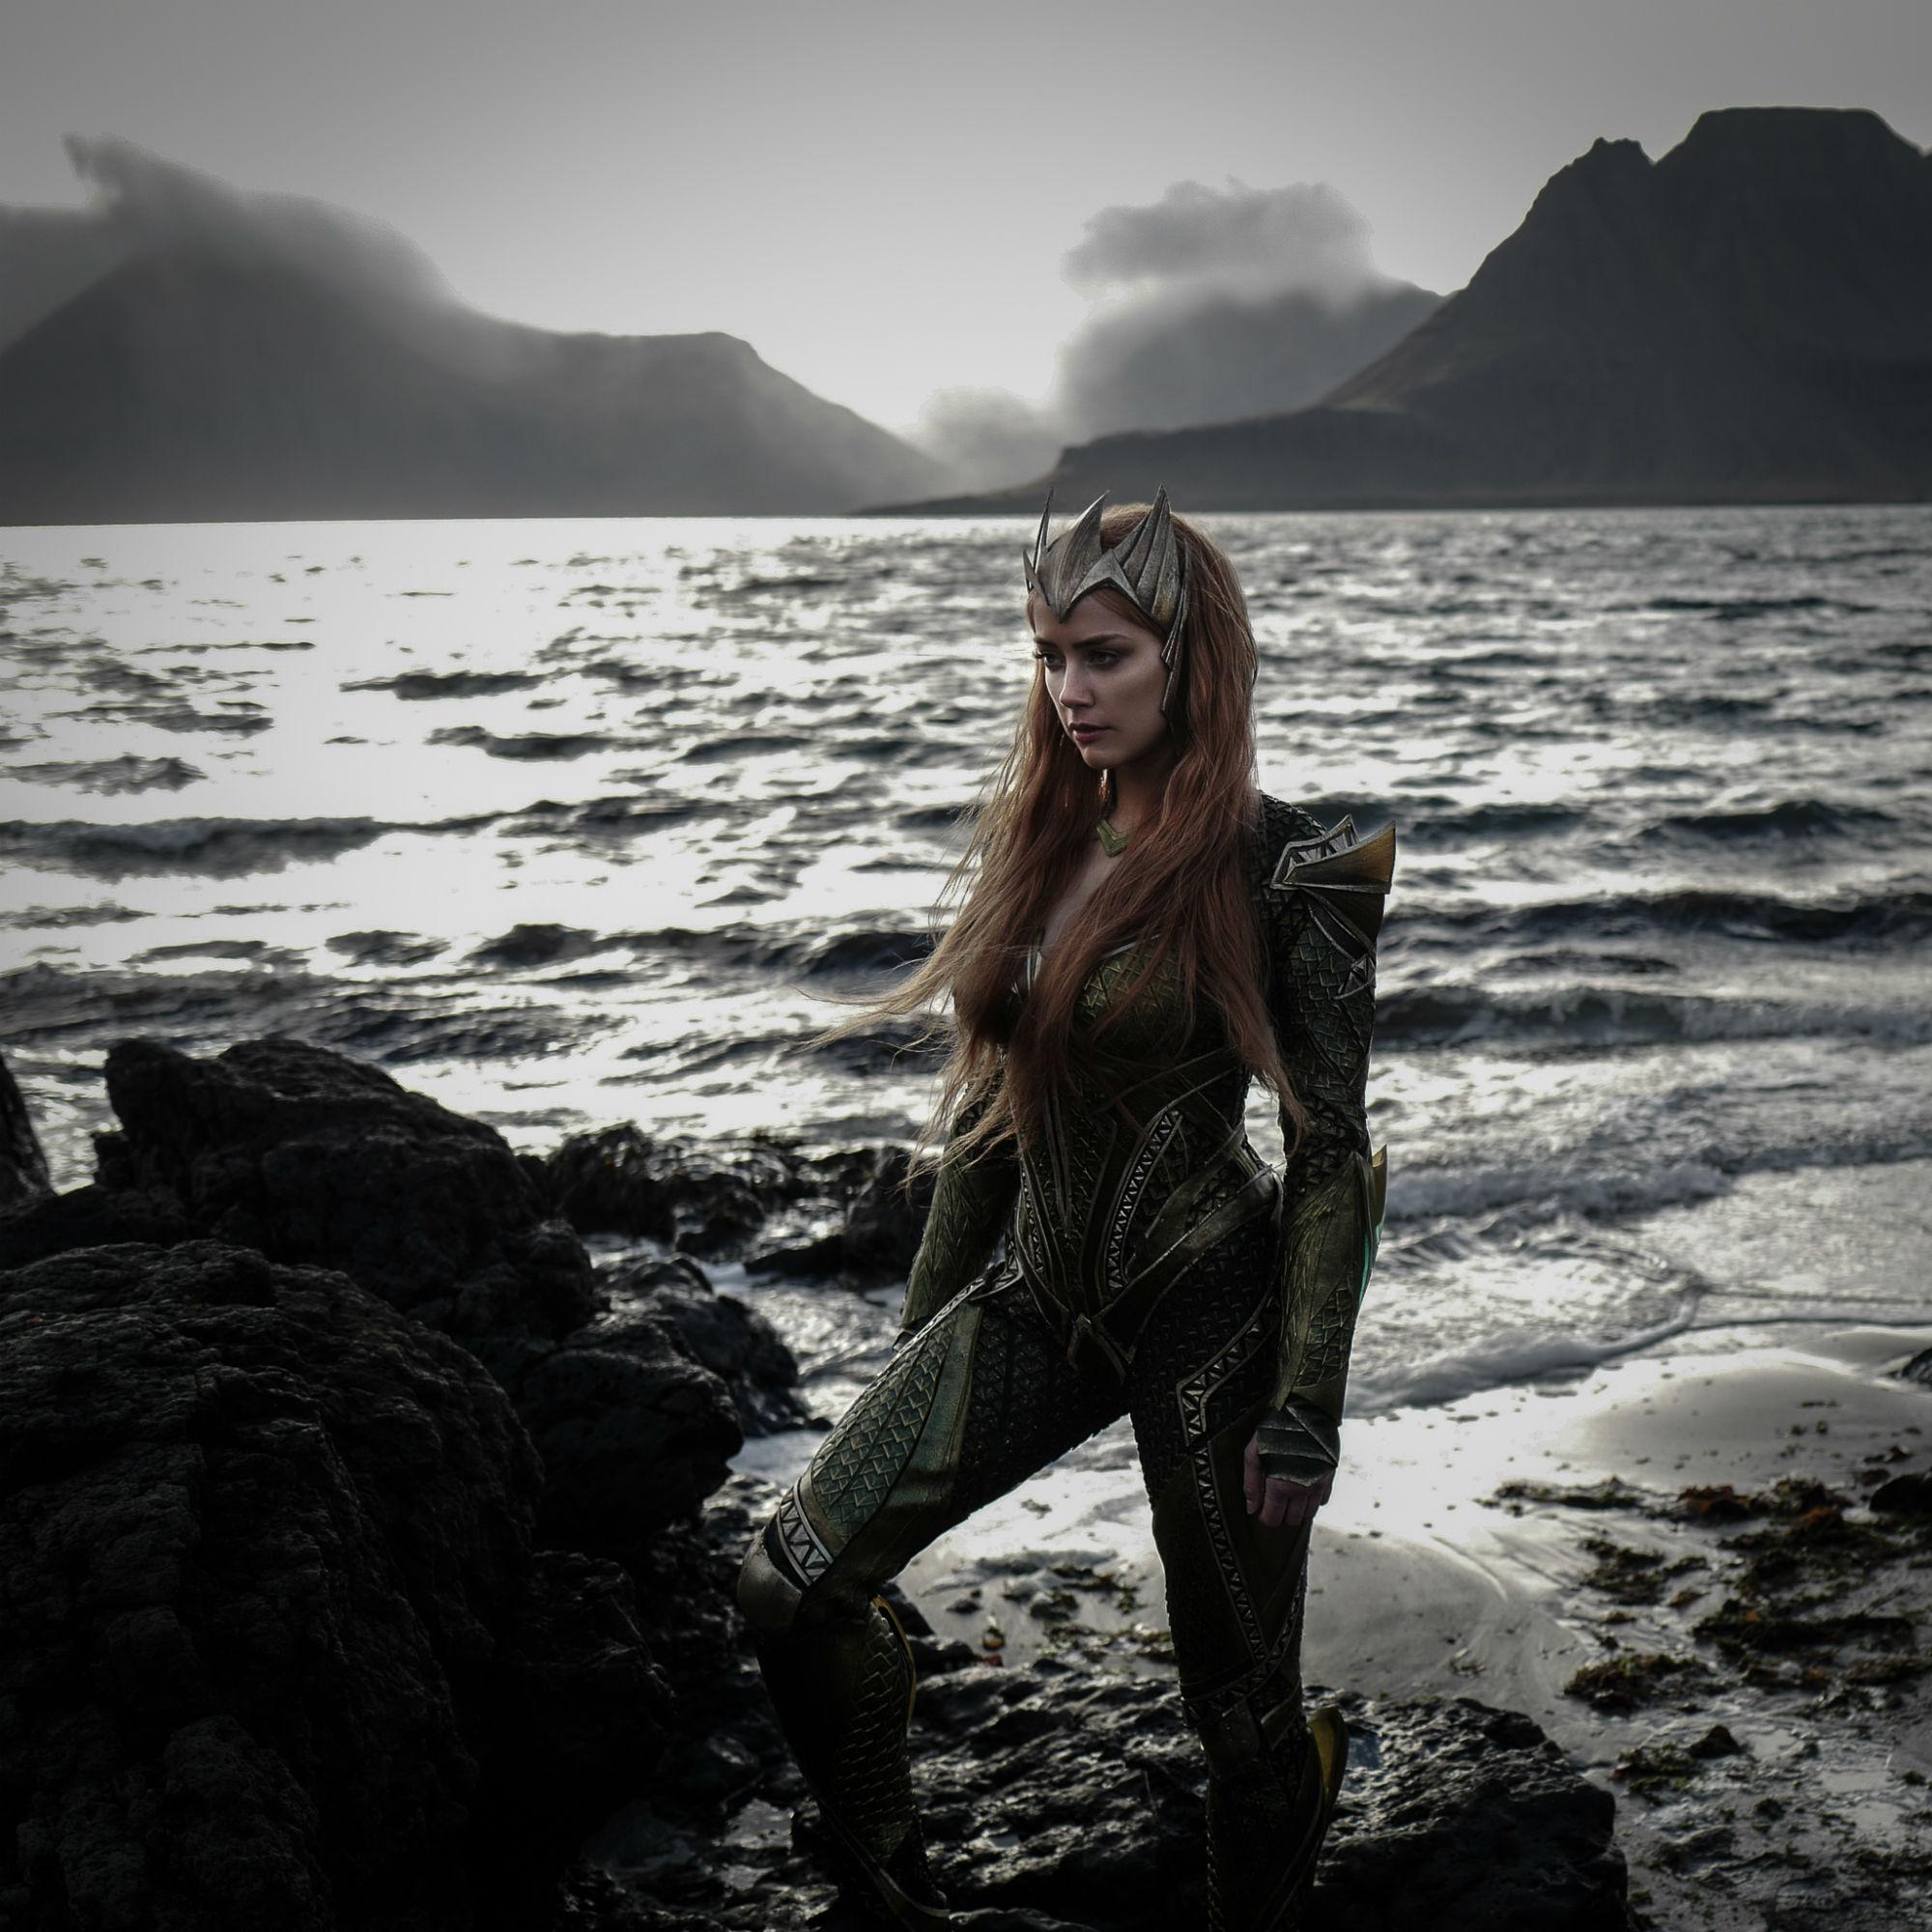 First look at Amber Heard as Mera!